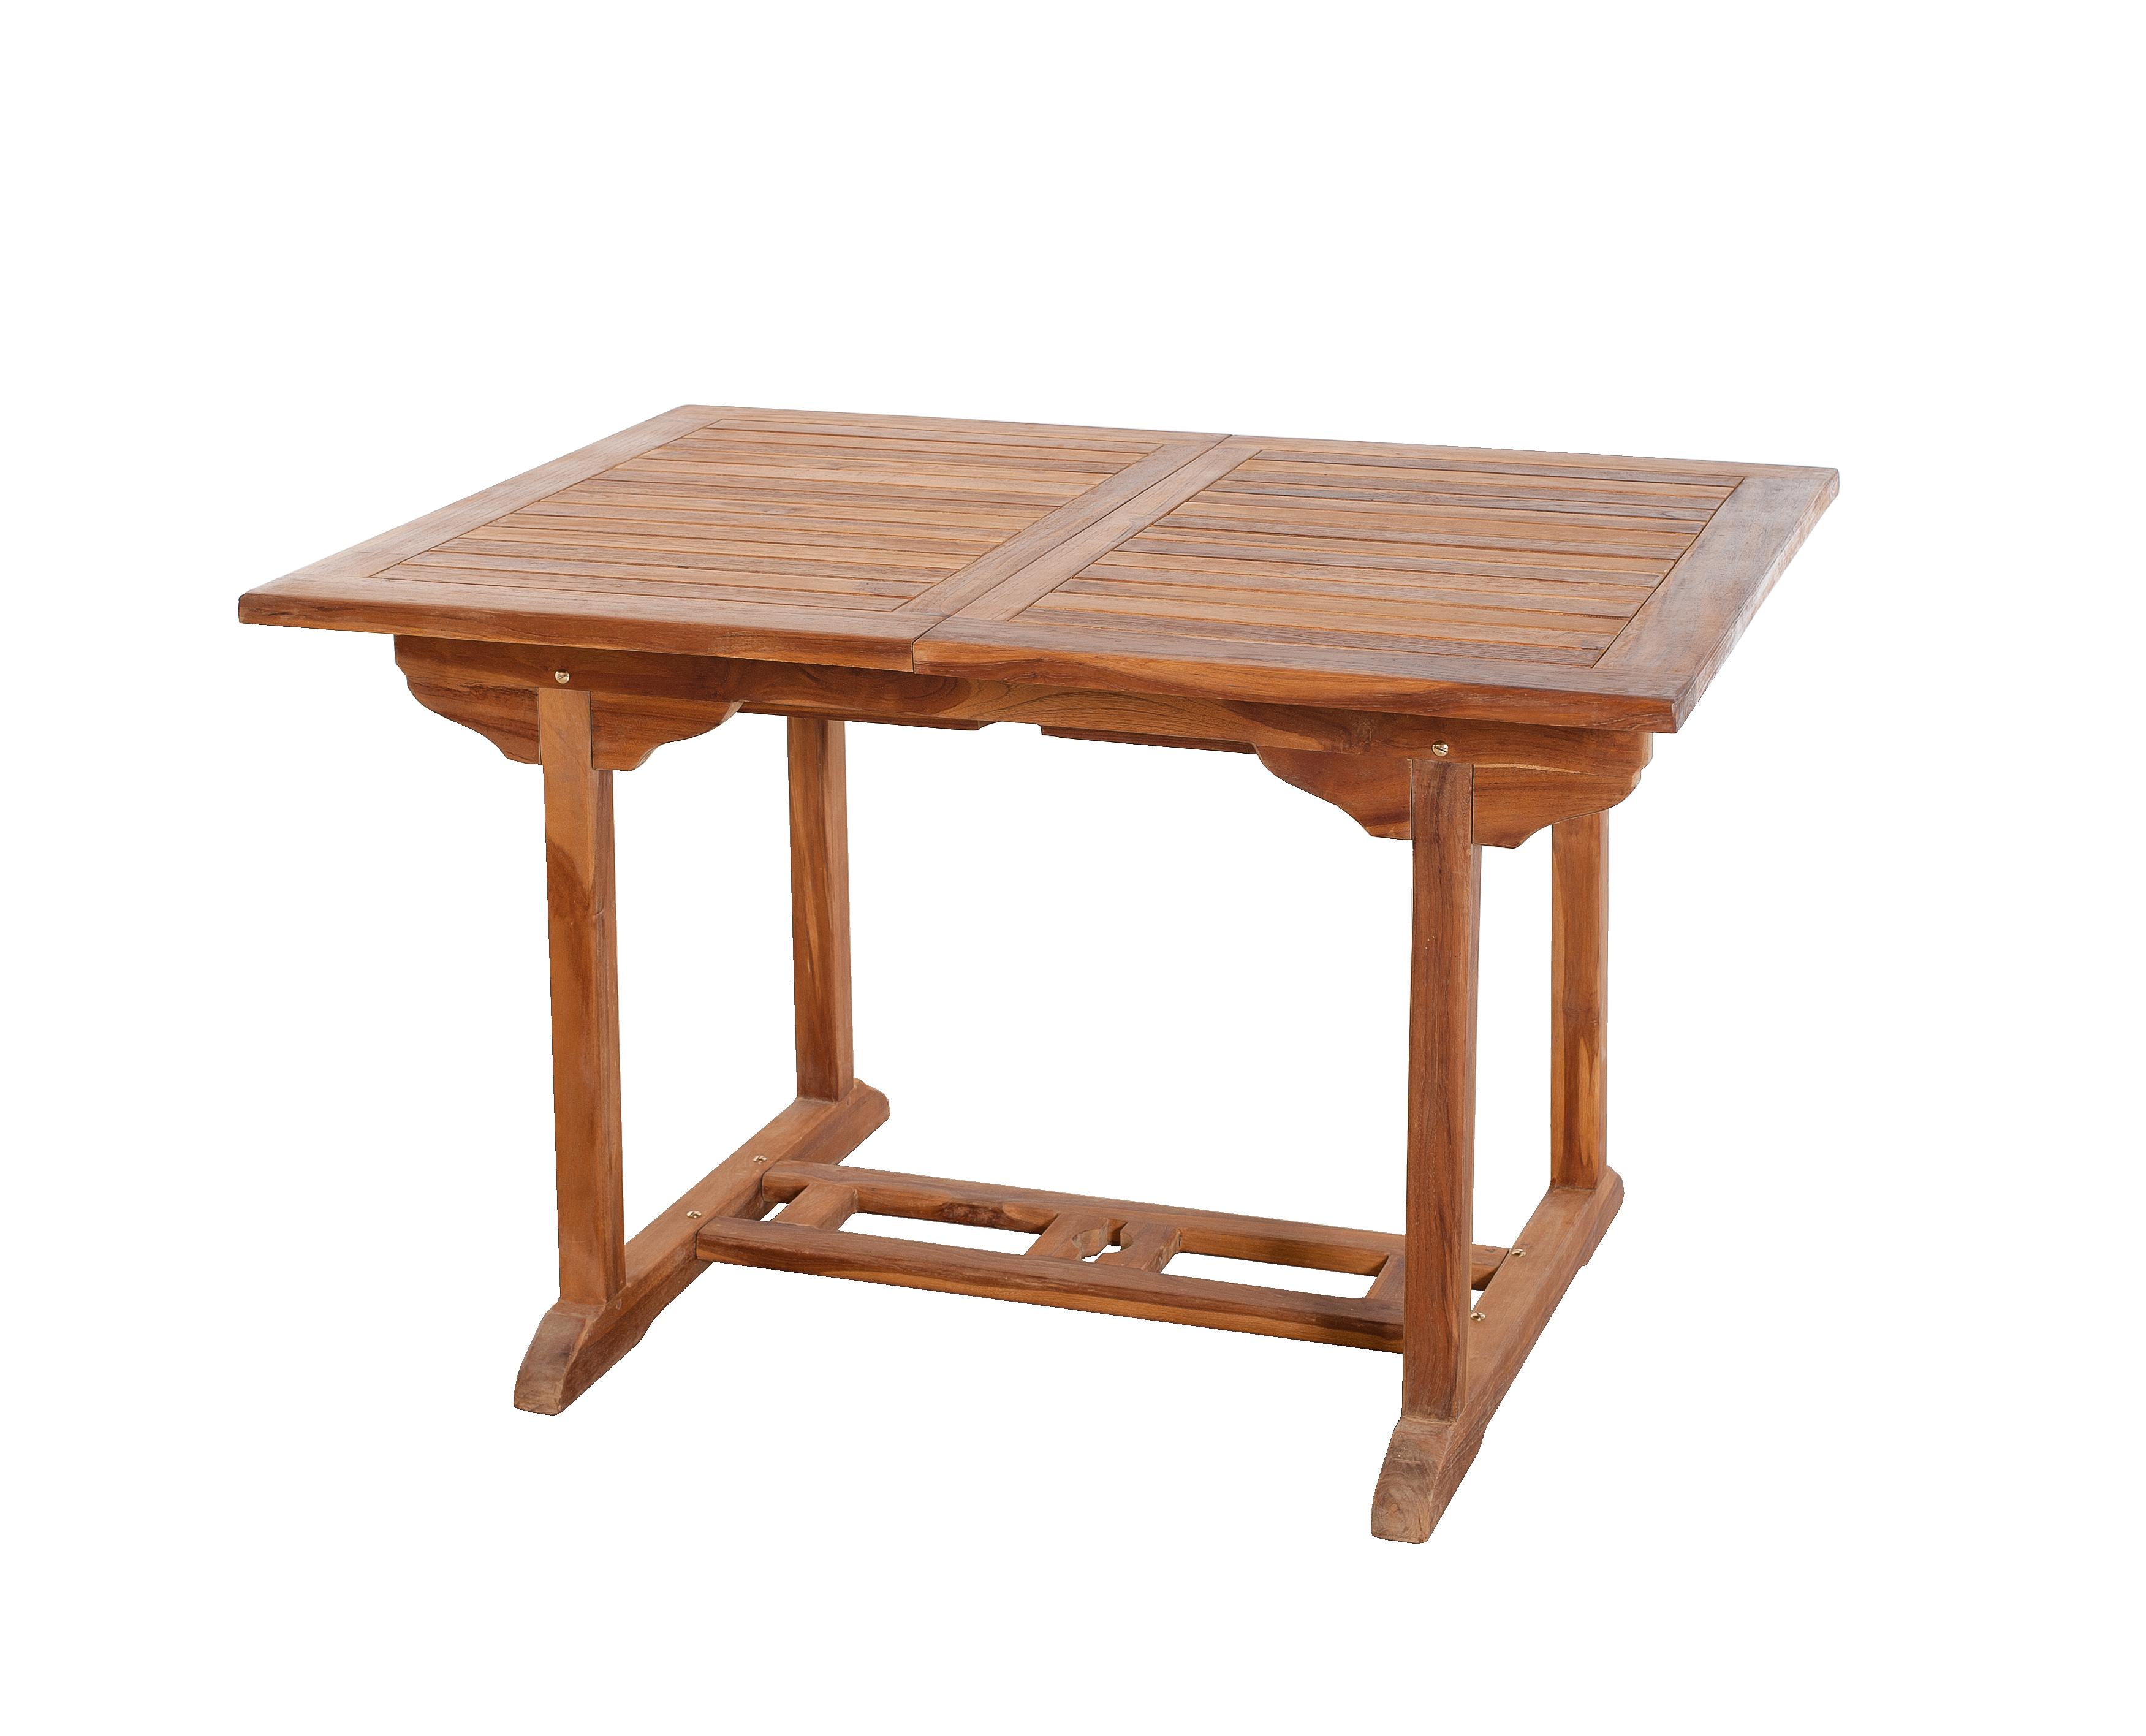 Table de jardin en teck huilé rectangle extensible 120/180x90x75 MACAO